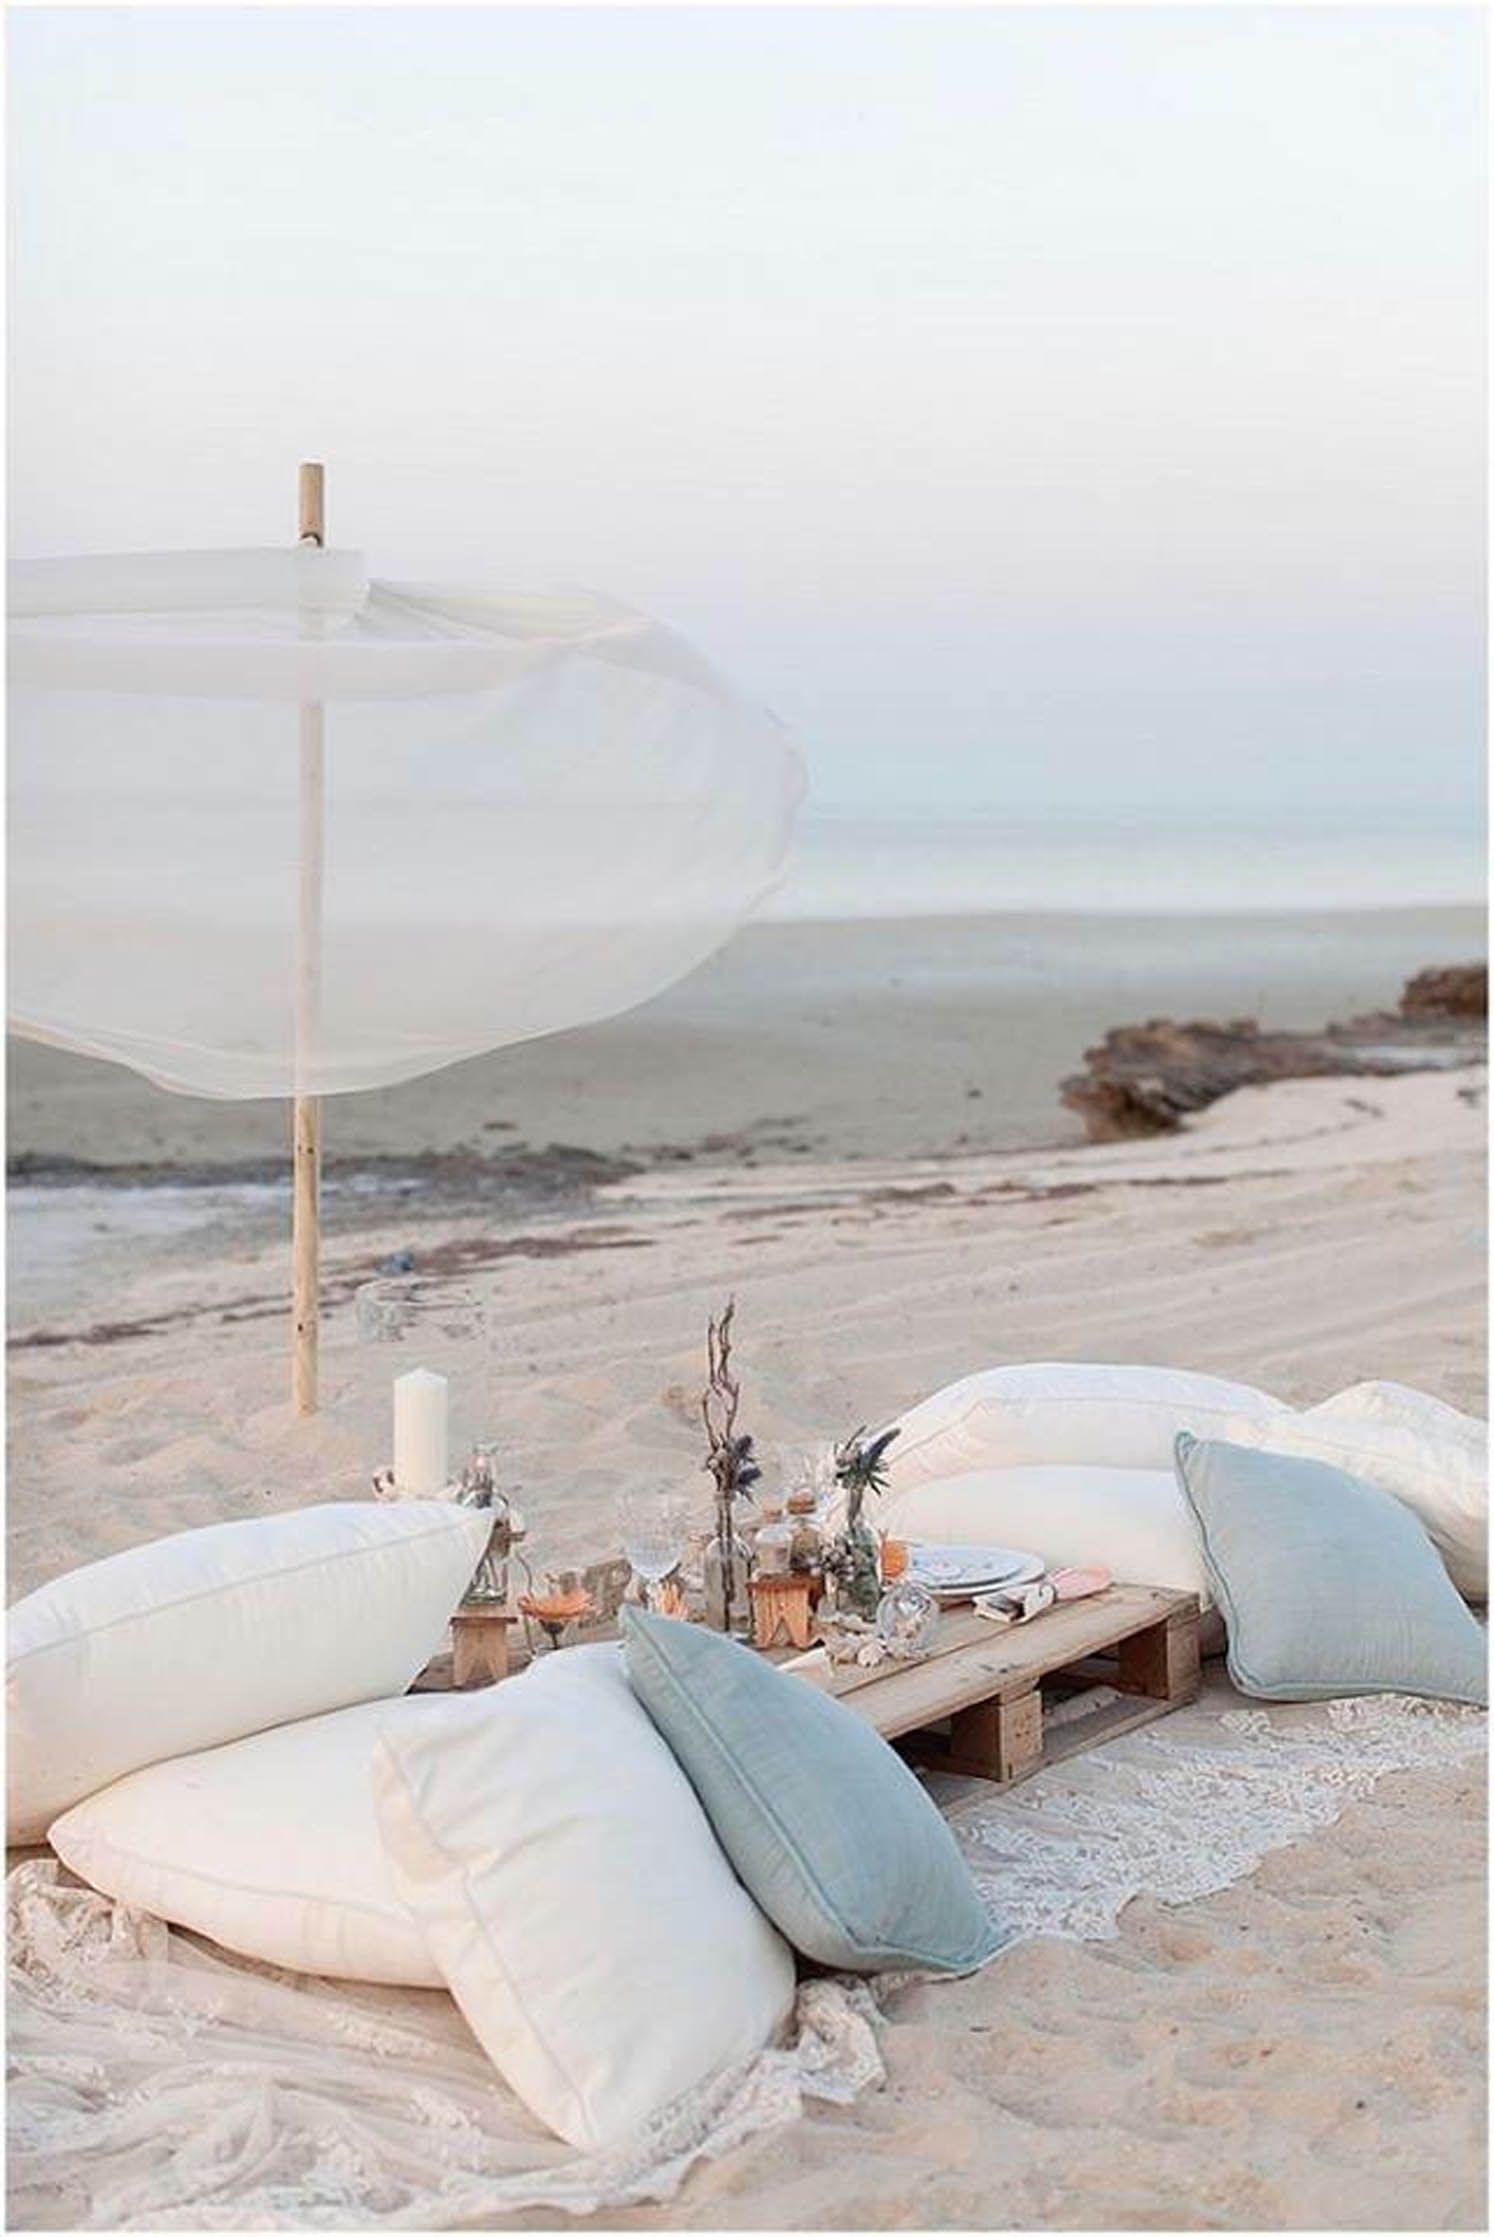 Beach Party Shipwreck Picnic Mat Night Table